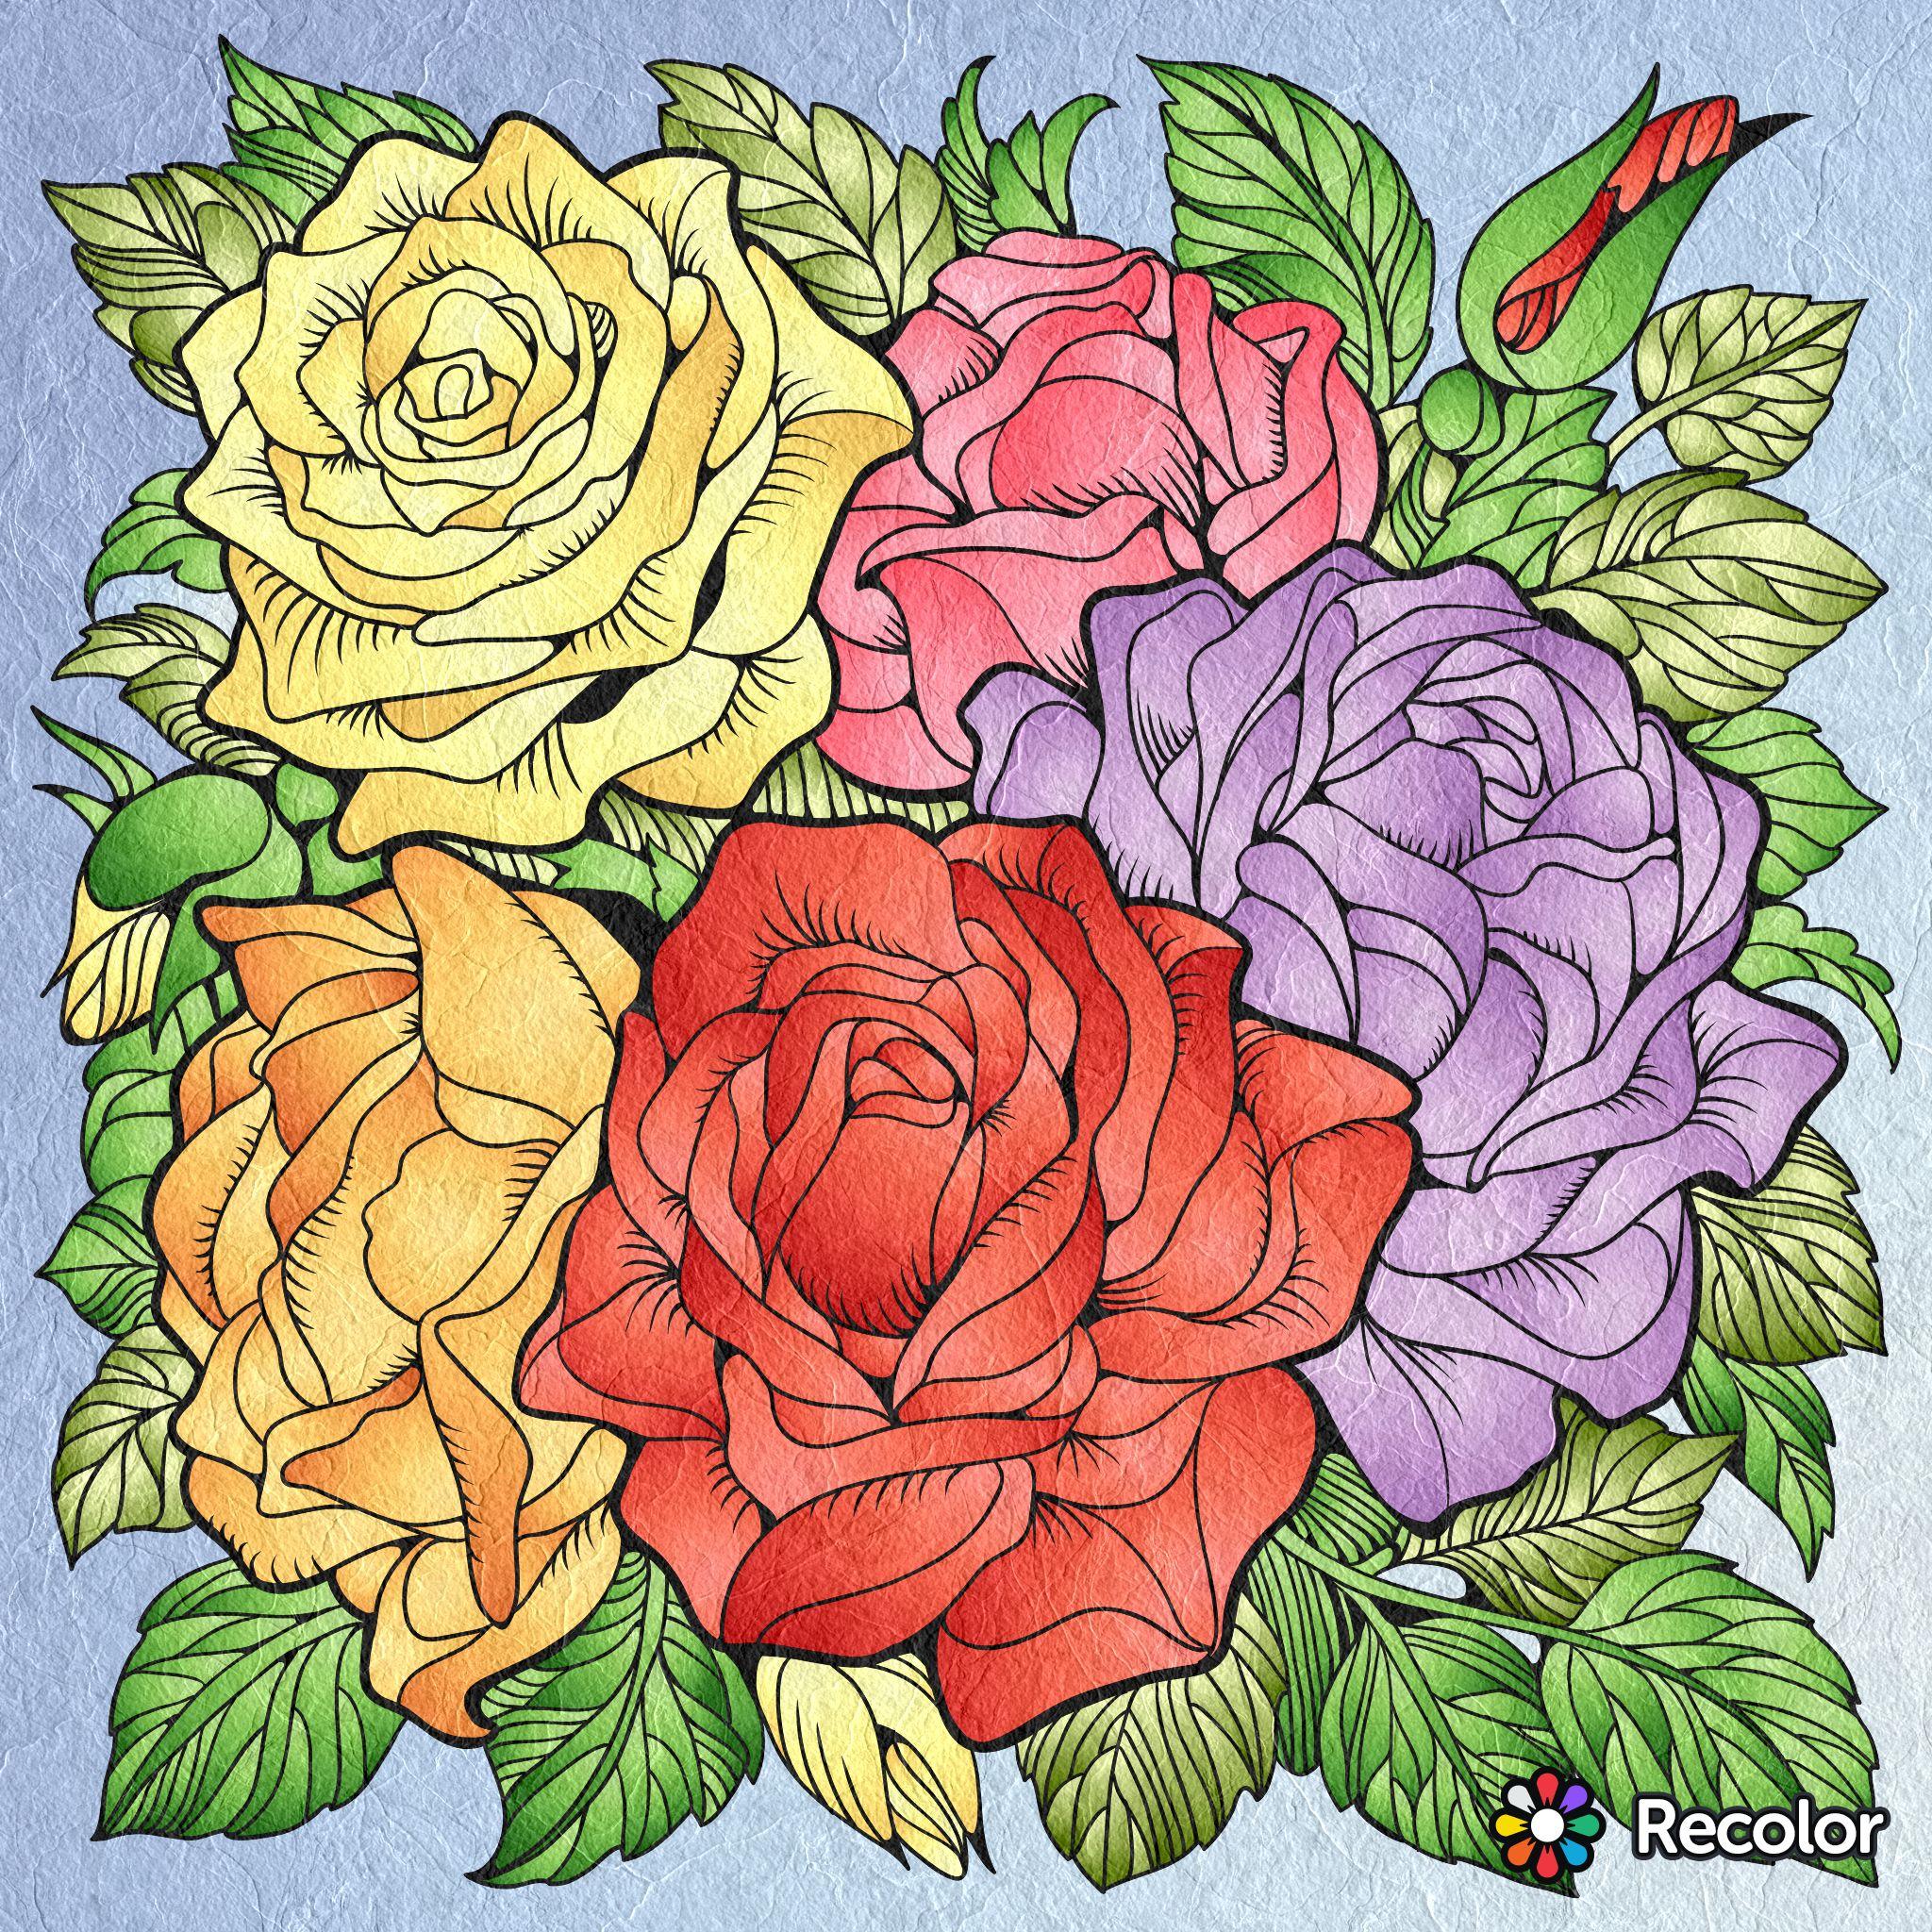 Pin by Angela Gurgu on Modele cu flori | Pinterest | Coloring books